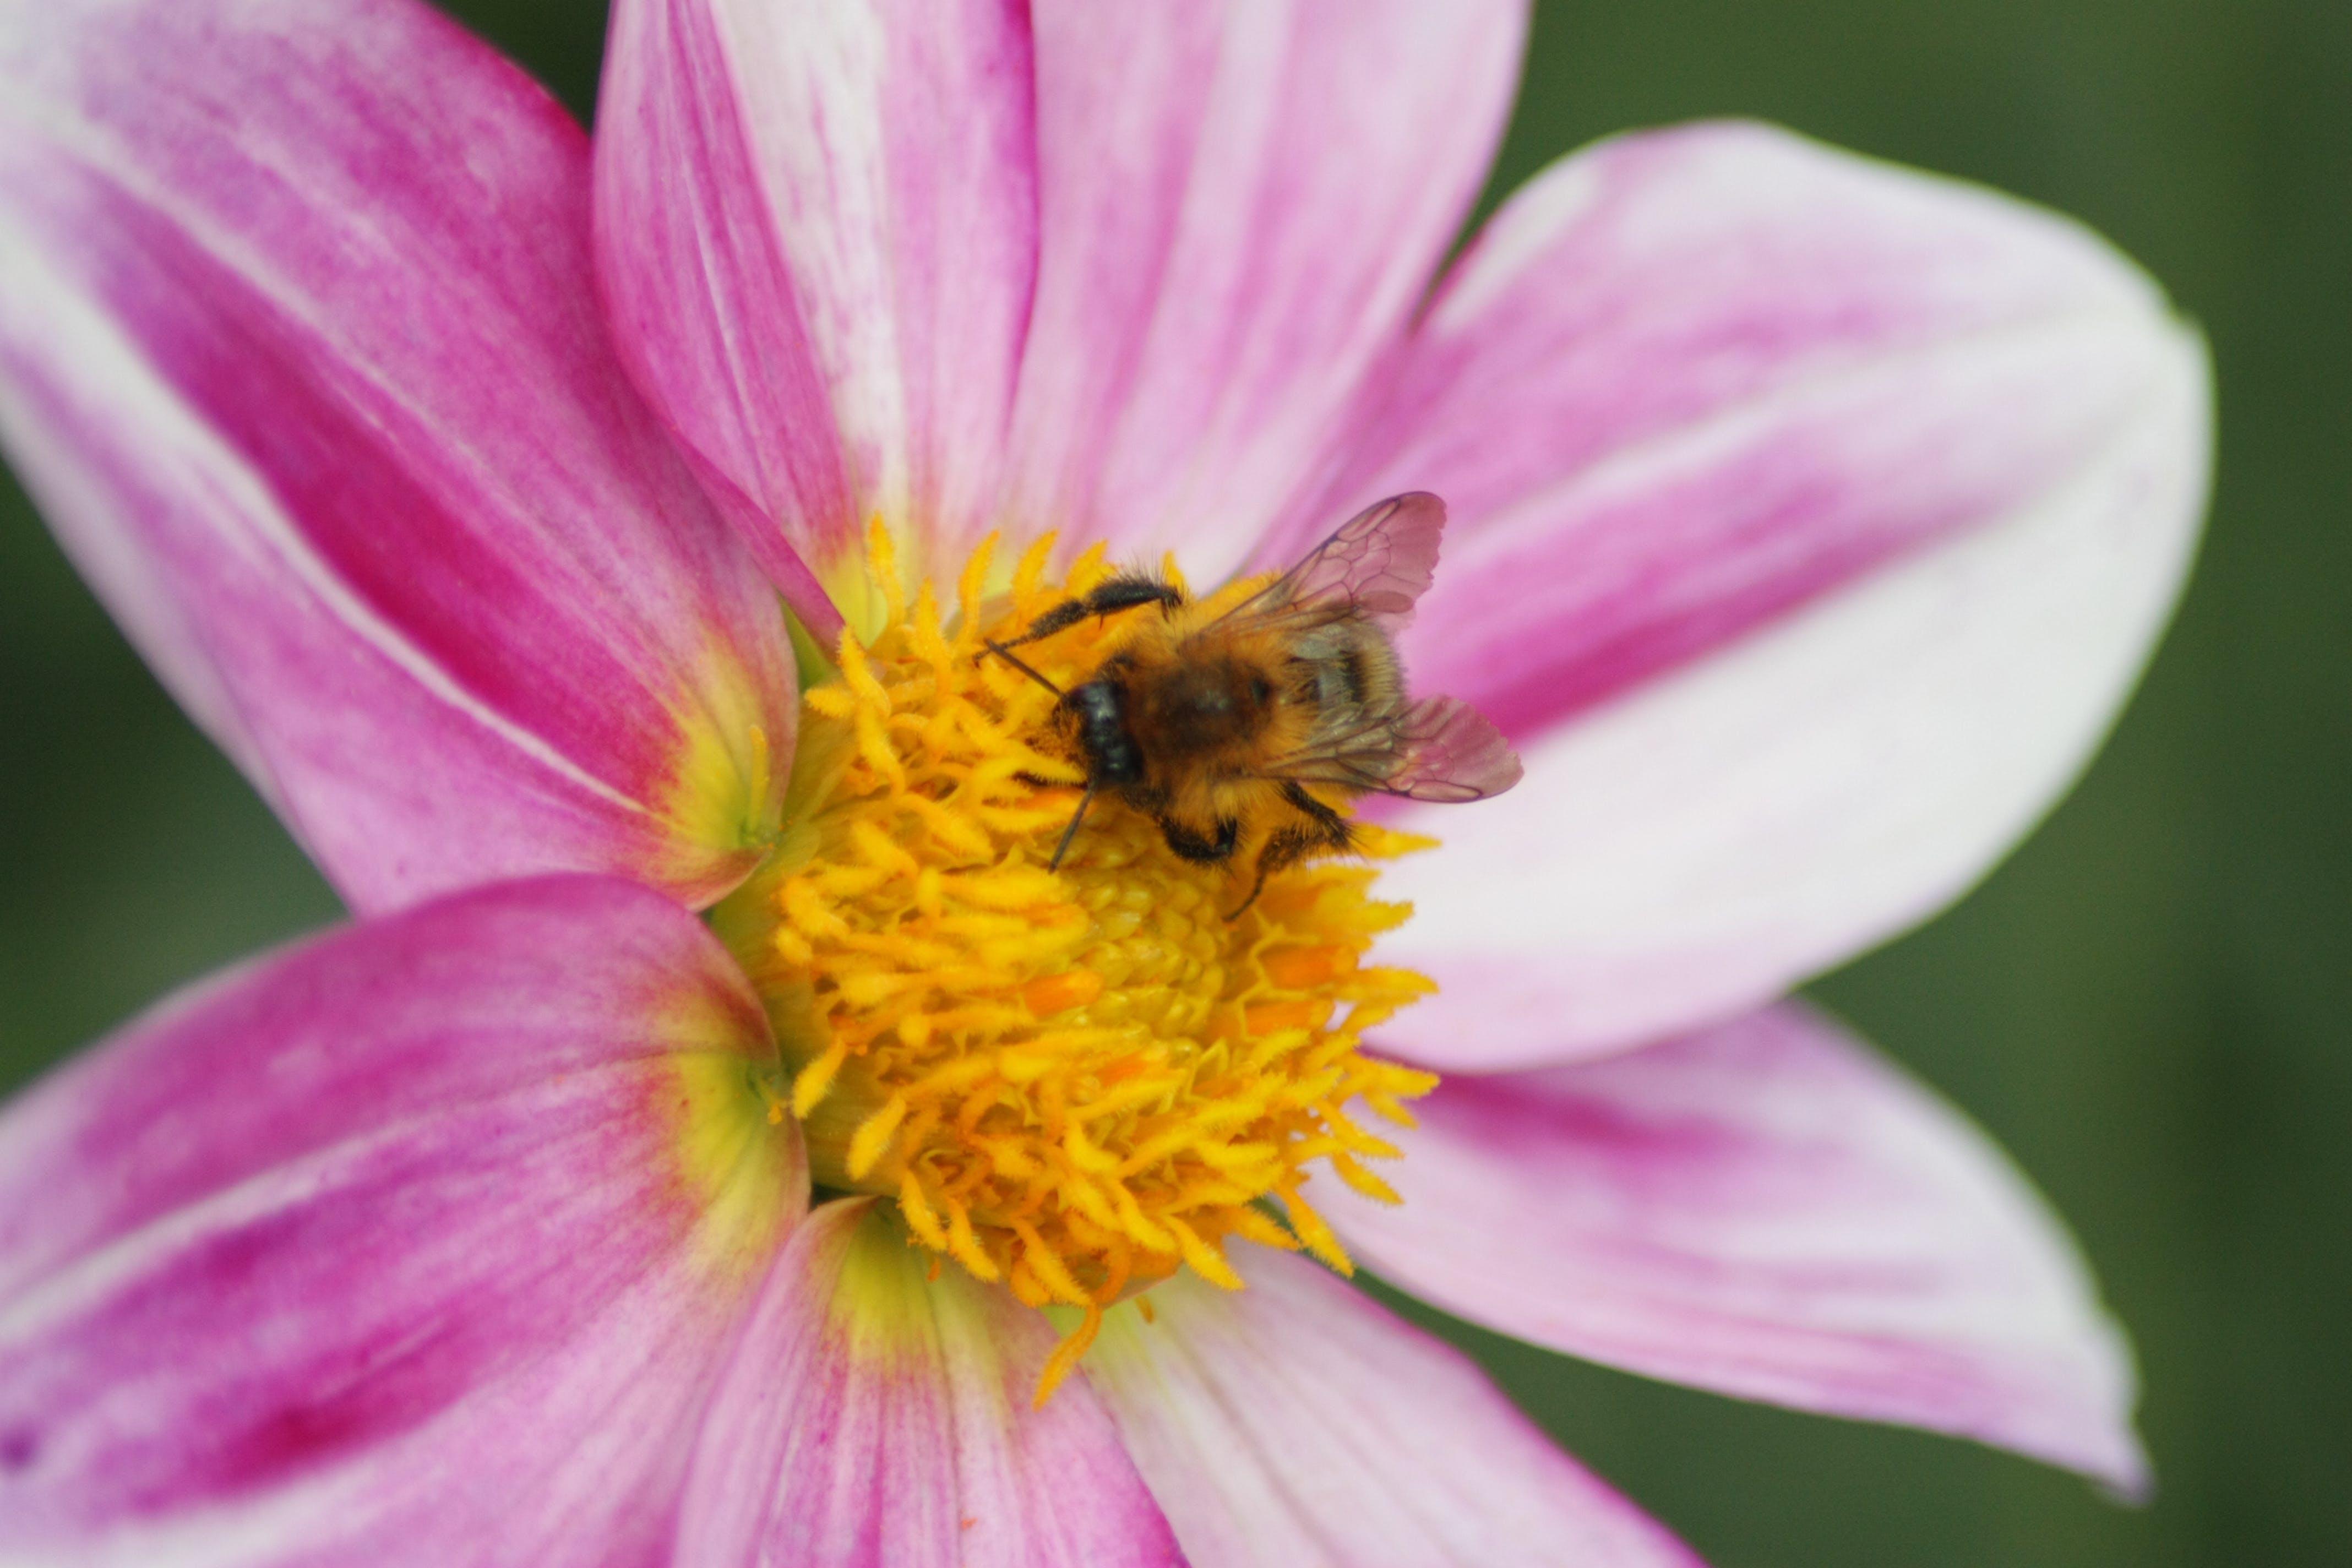 Fotos de stock gratuitas de abeja, flor, Francia, jardines